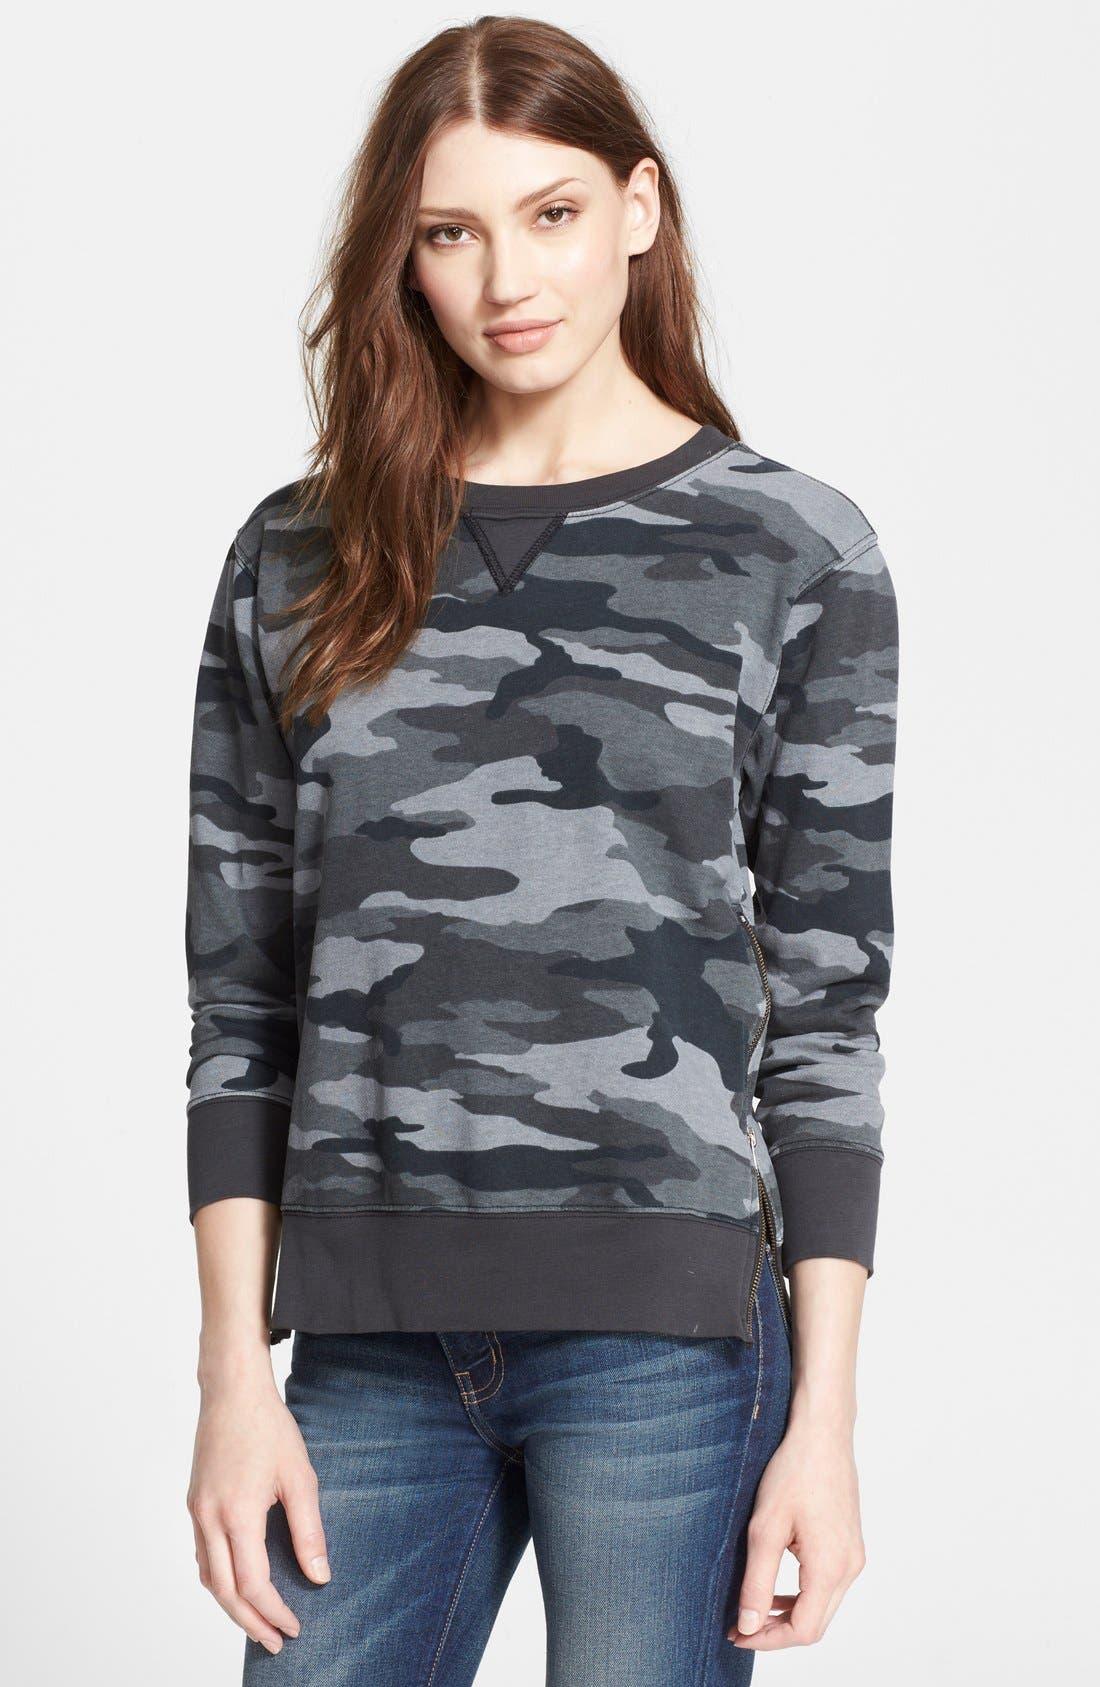 Alternate Image 1 Selected - Current/Elliott 'The Stadium' Side Zip Camo Sweater